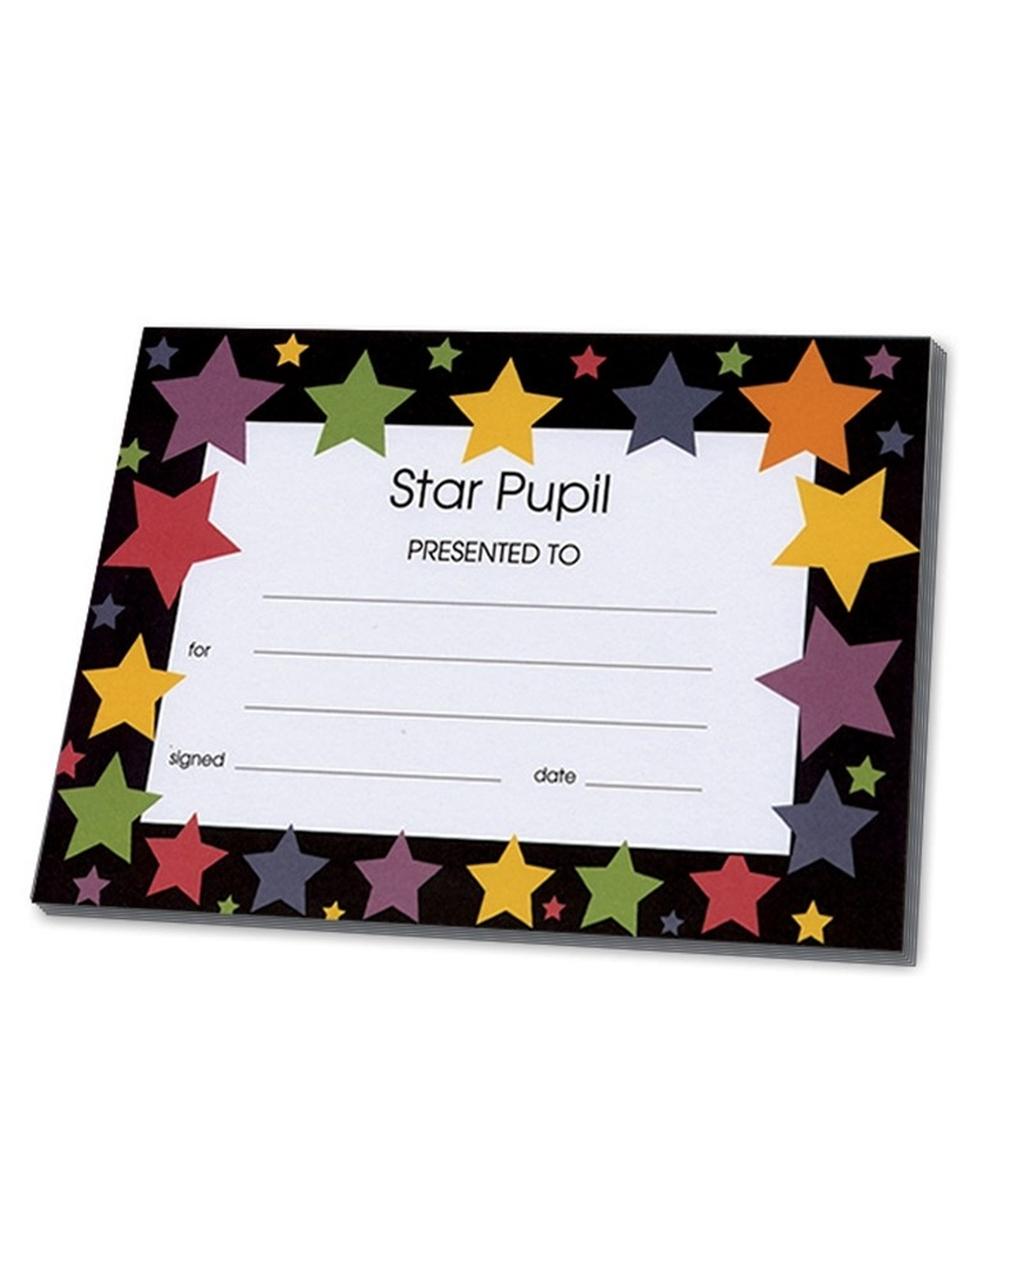 Certifcates - Star Pupil